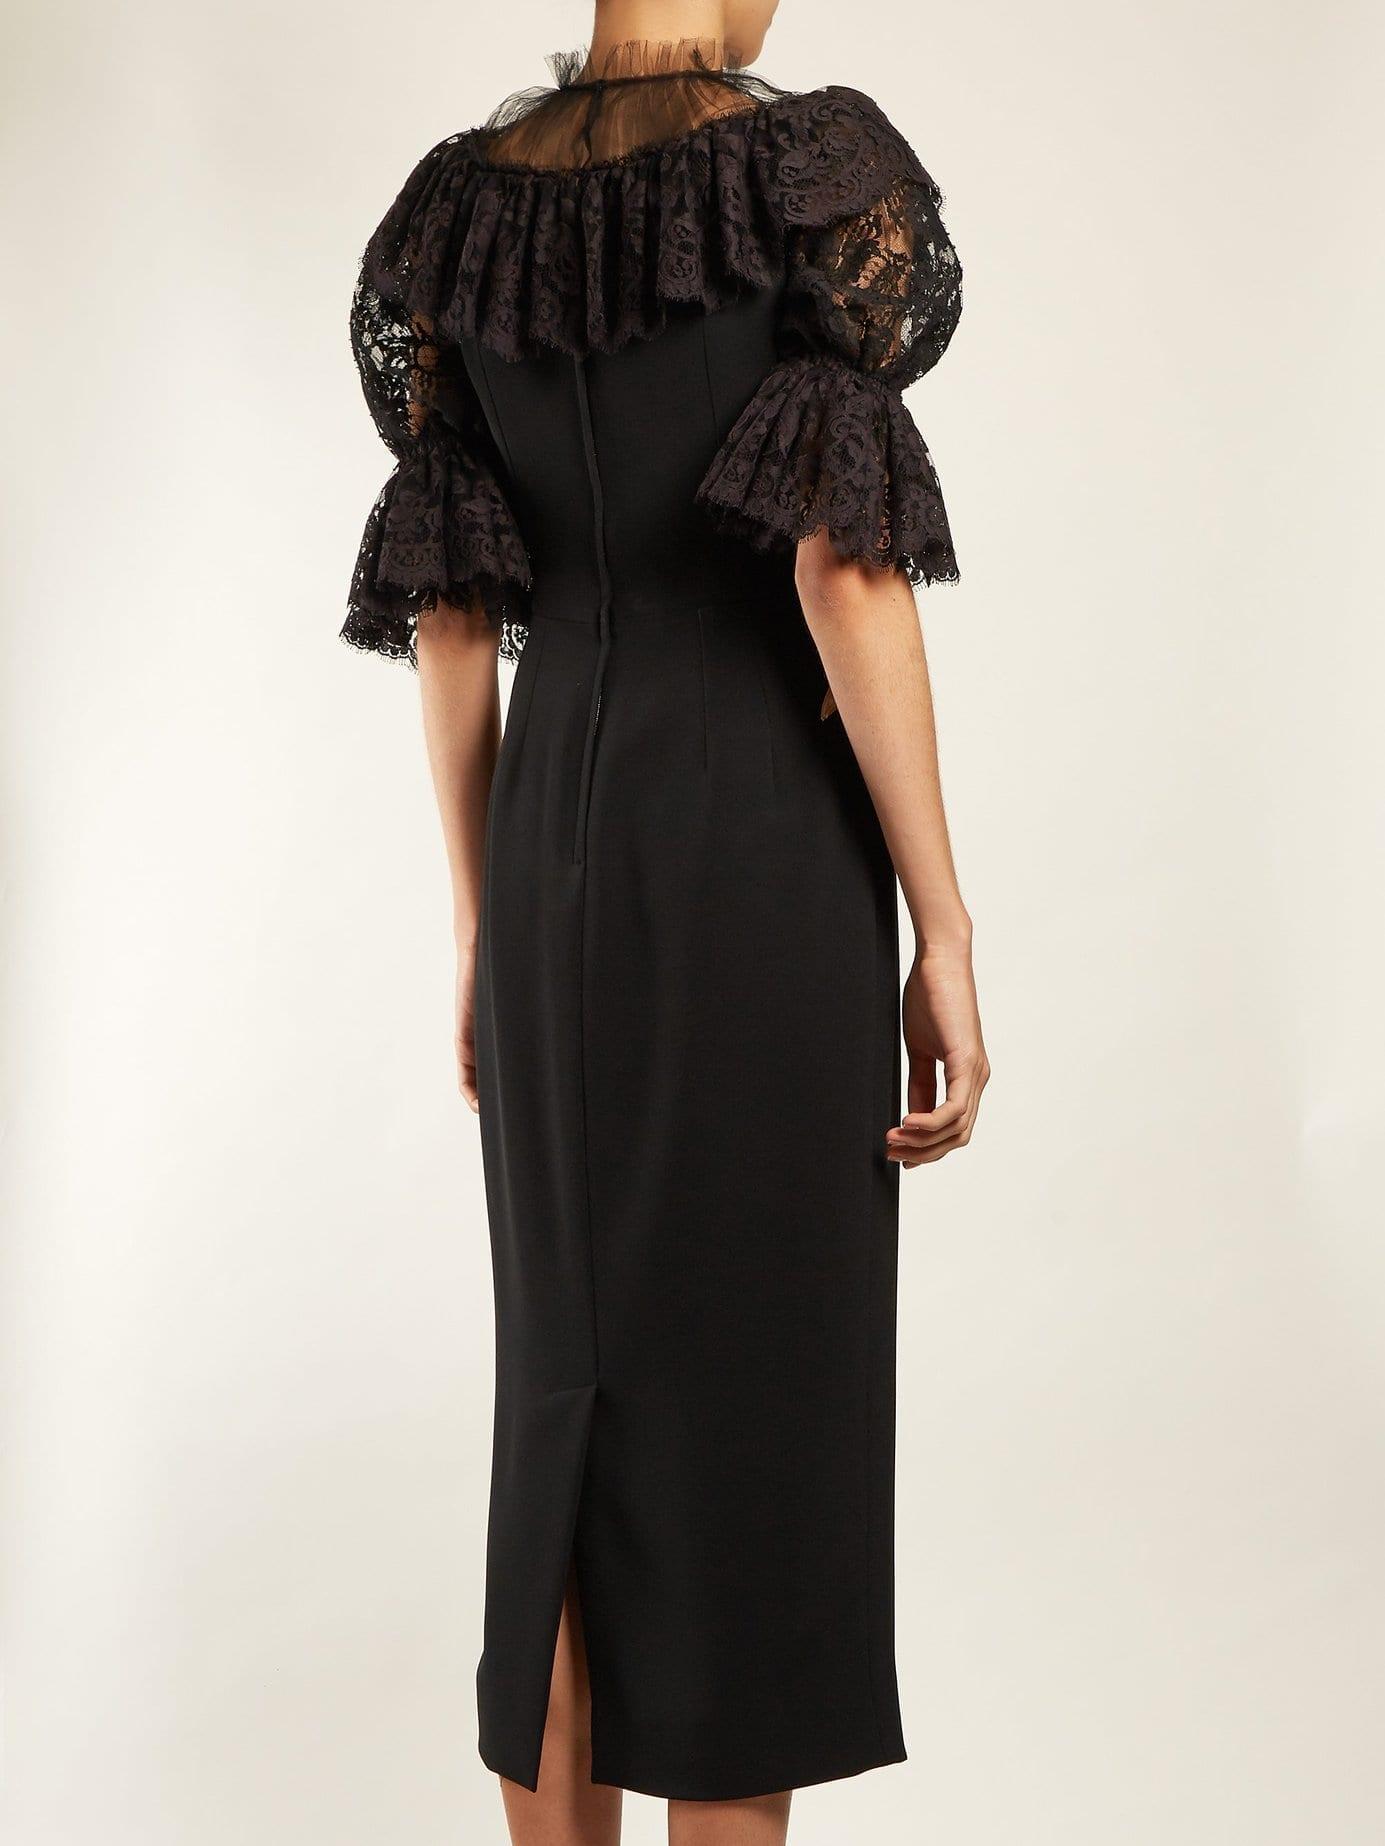 DOLCE & GABBANA Fashion Sinner Embroidered Midi Black Dress